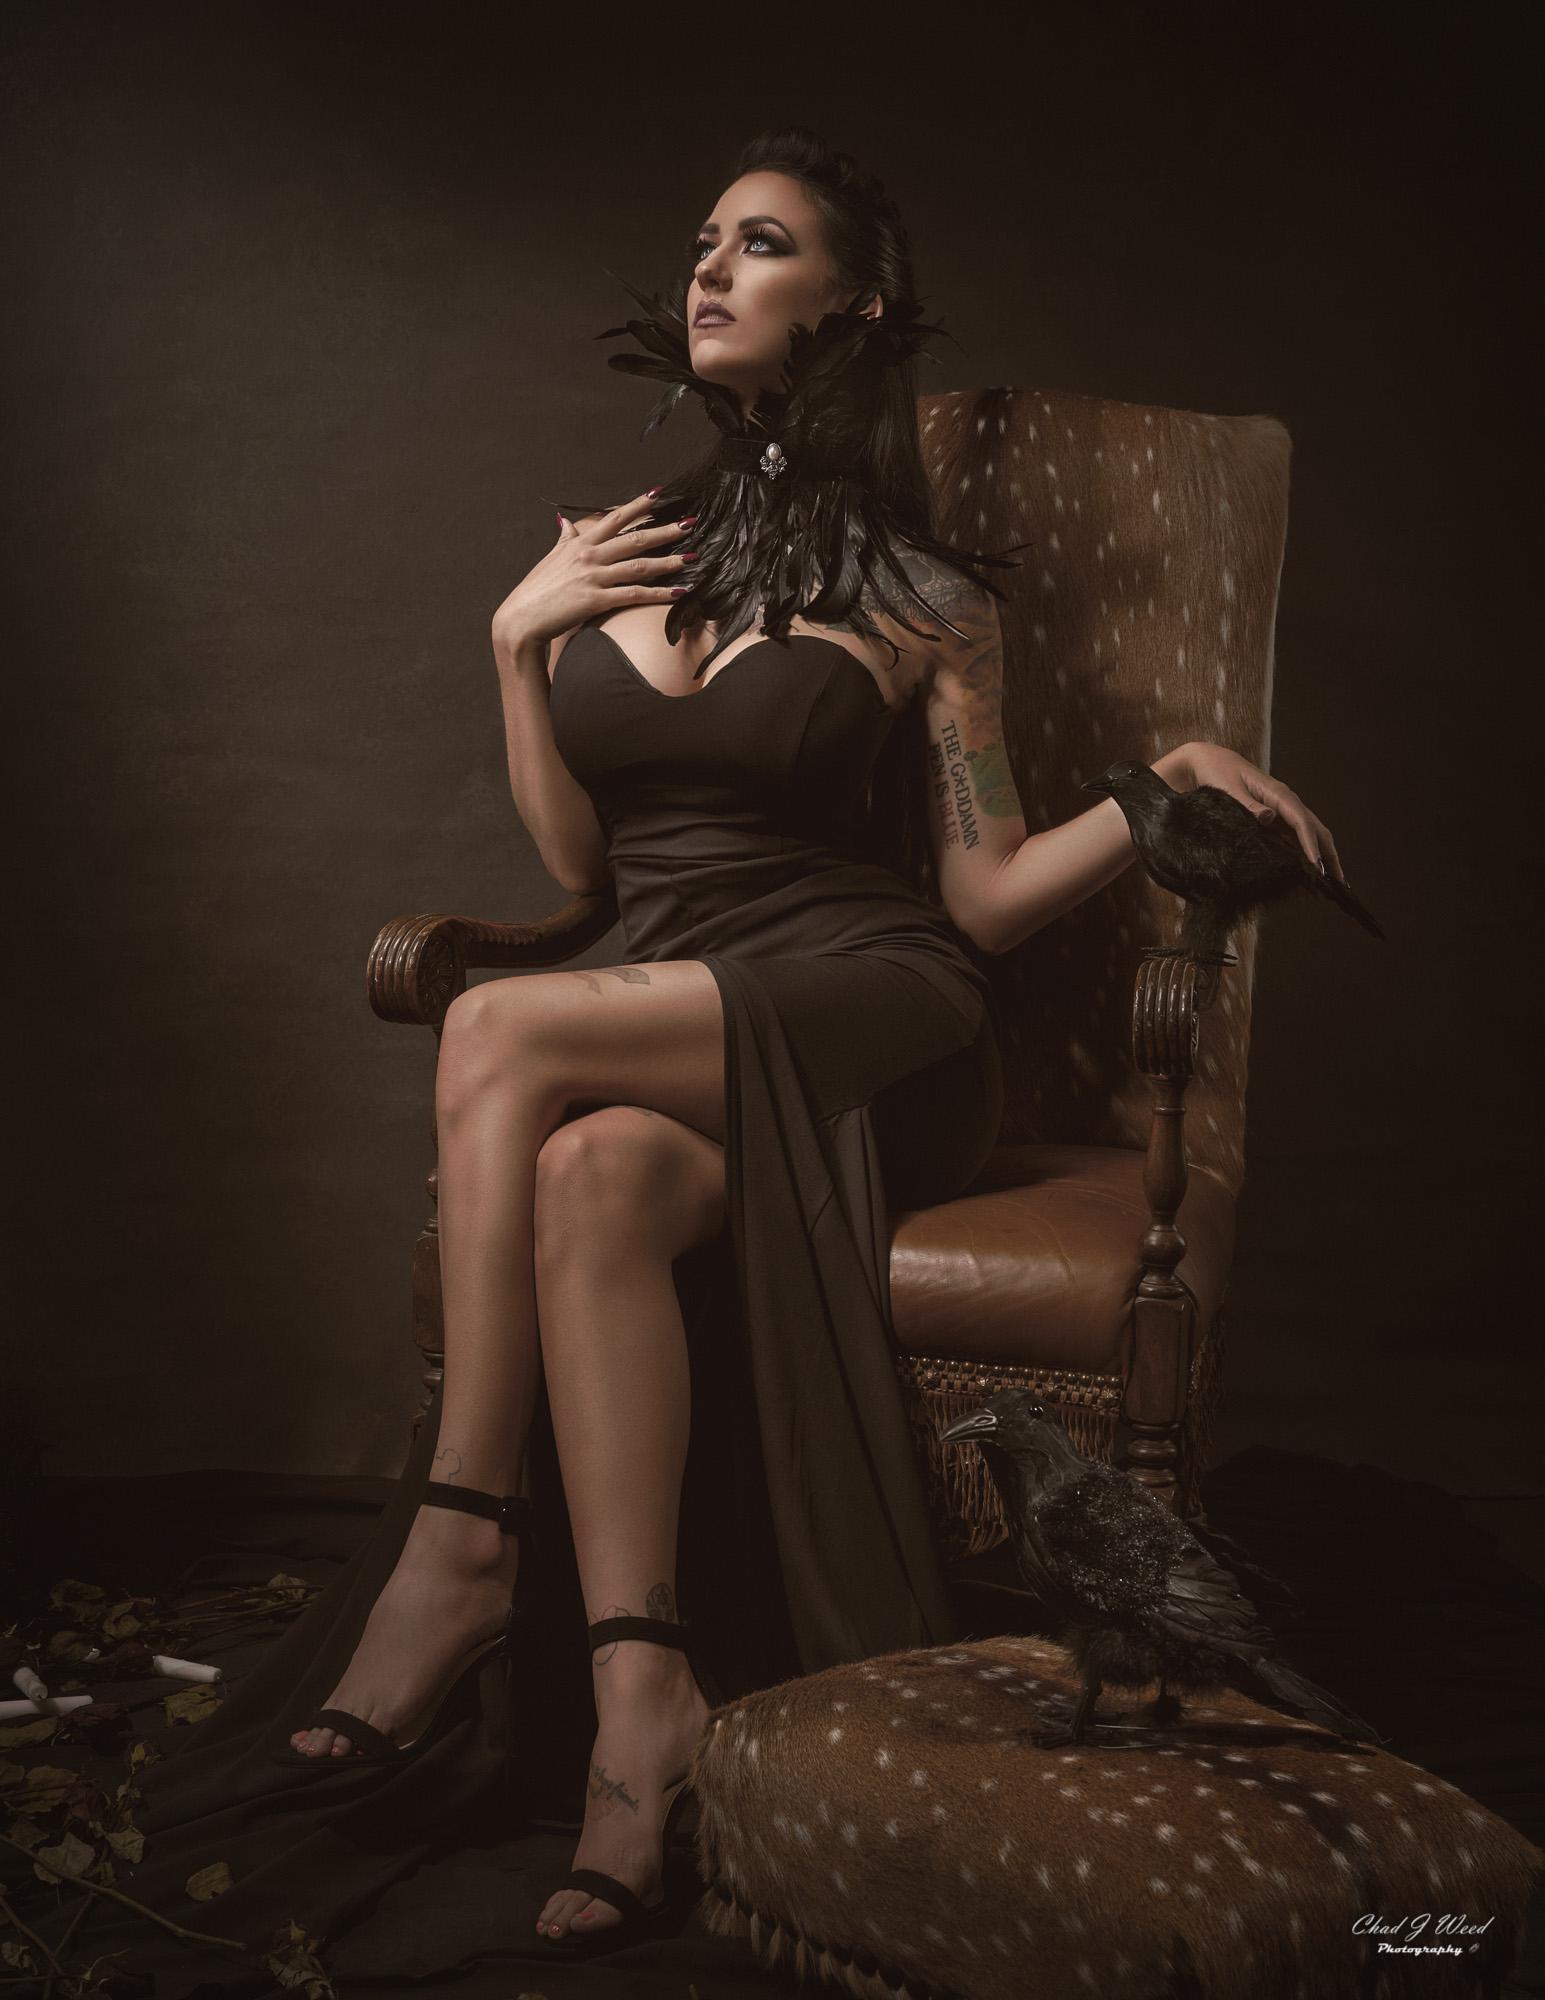 Halloween Theme with Fashion Model Lynda by Mesa Arizona Fashion Photographer Chad Weed